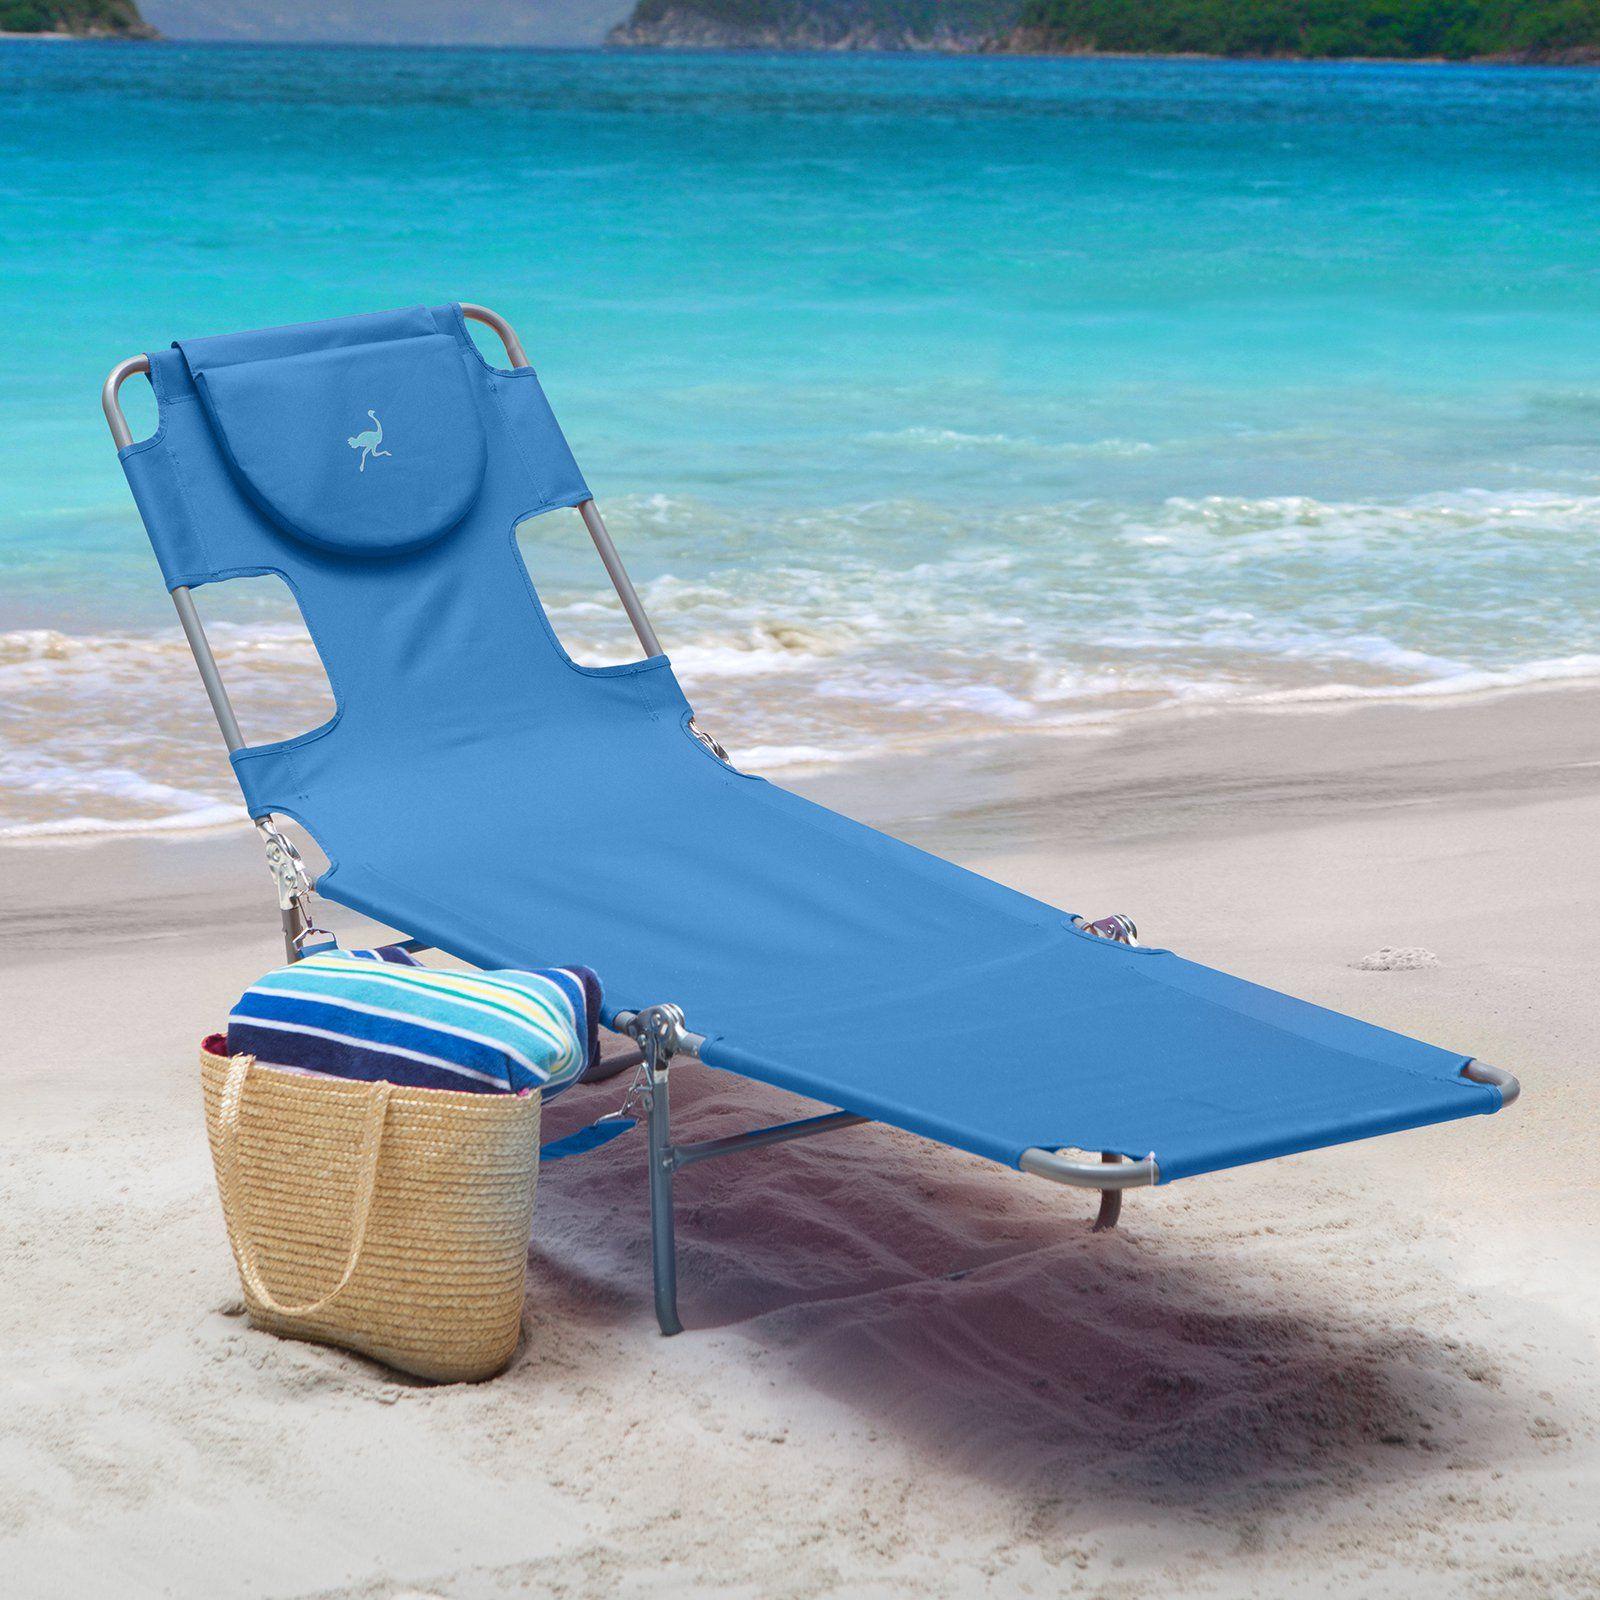 Ostrich Folding Chaise Lounge Walmart Com Folding Lounge Chair Beach Chairs Portable Beach Chairs